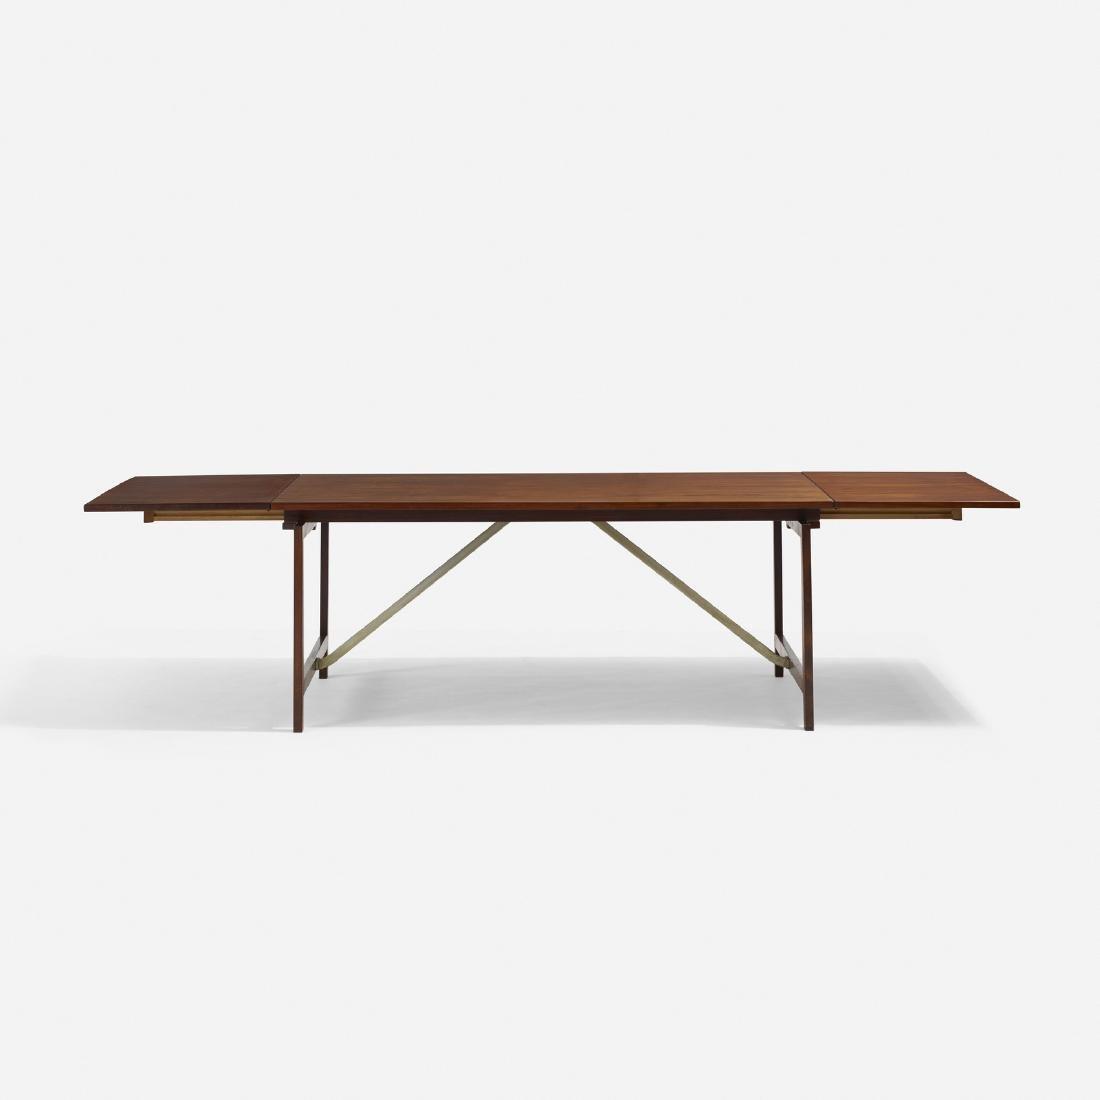 Hans J. Wegner, drop-leaf dining table - 2